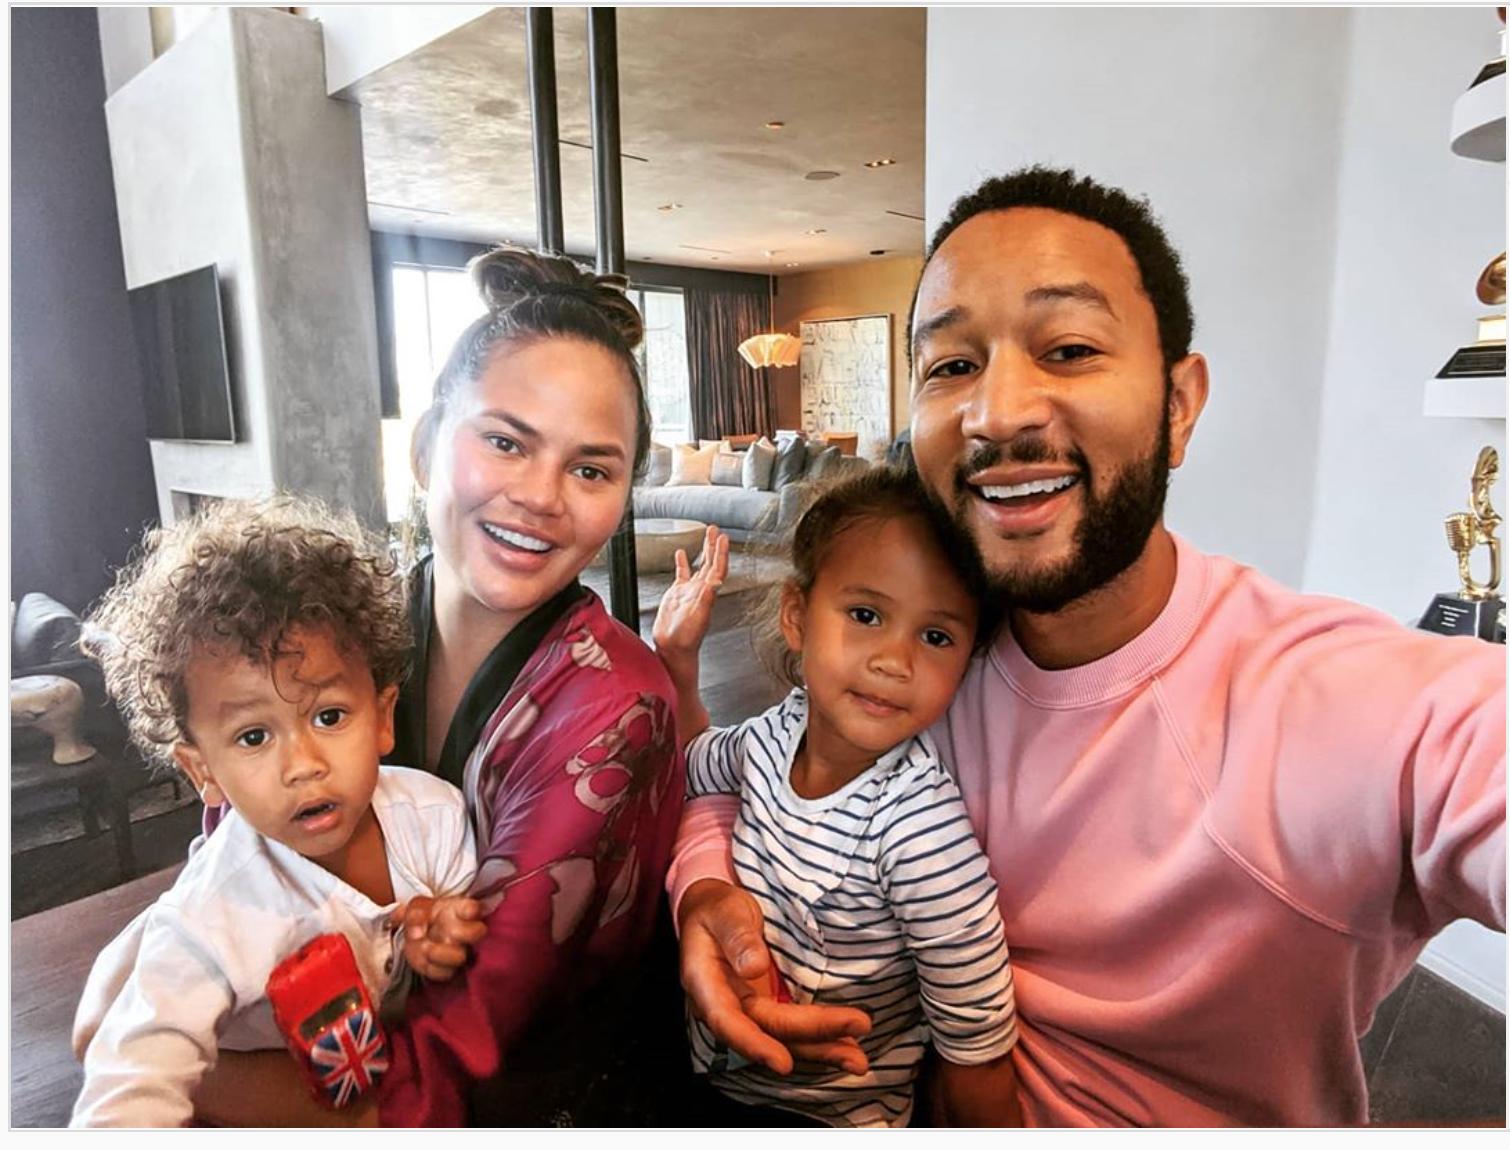 John Legend, Chrissy Teigen, and children